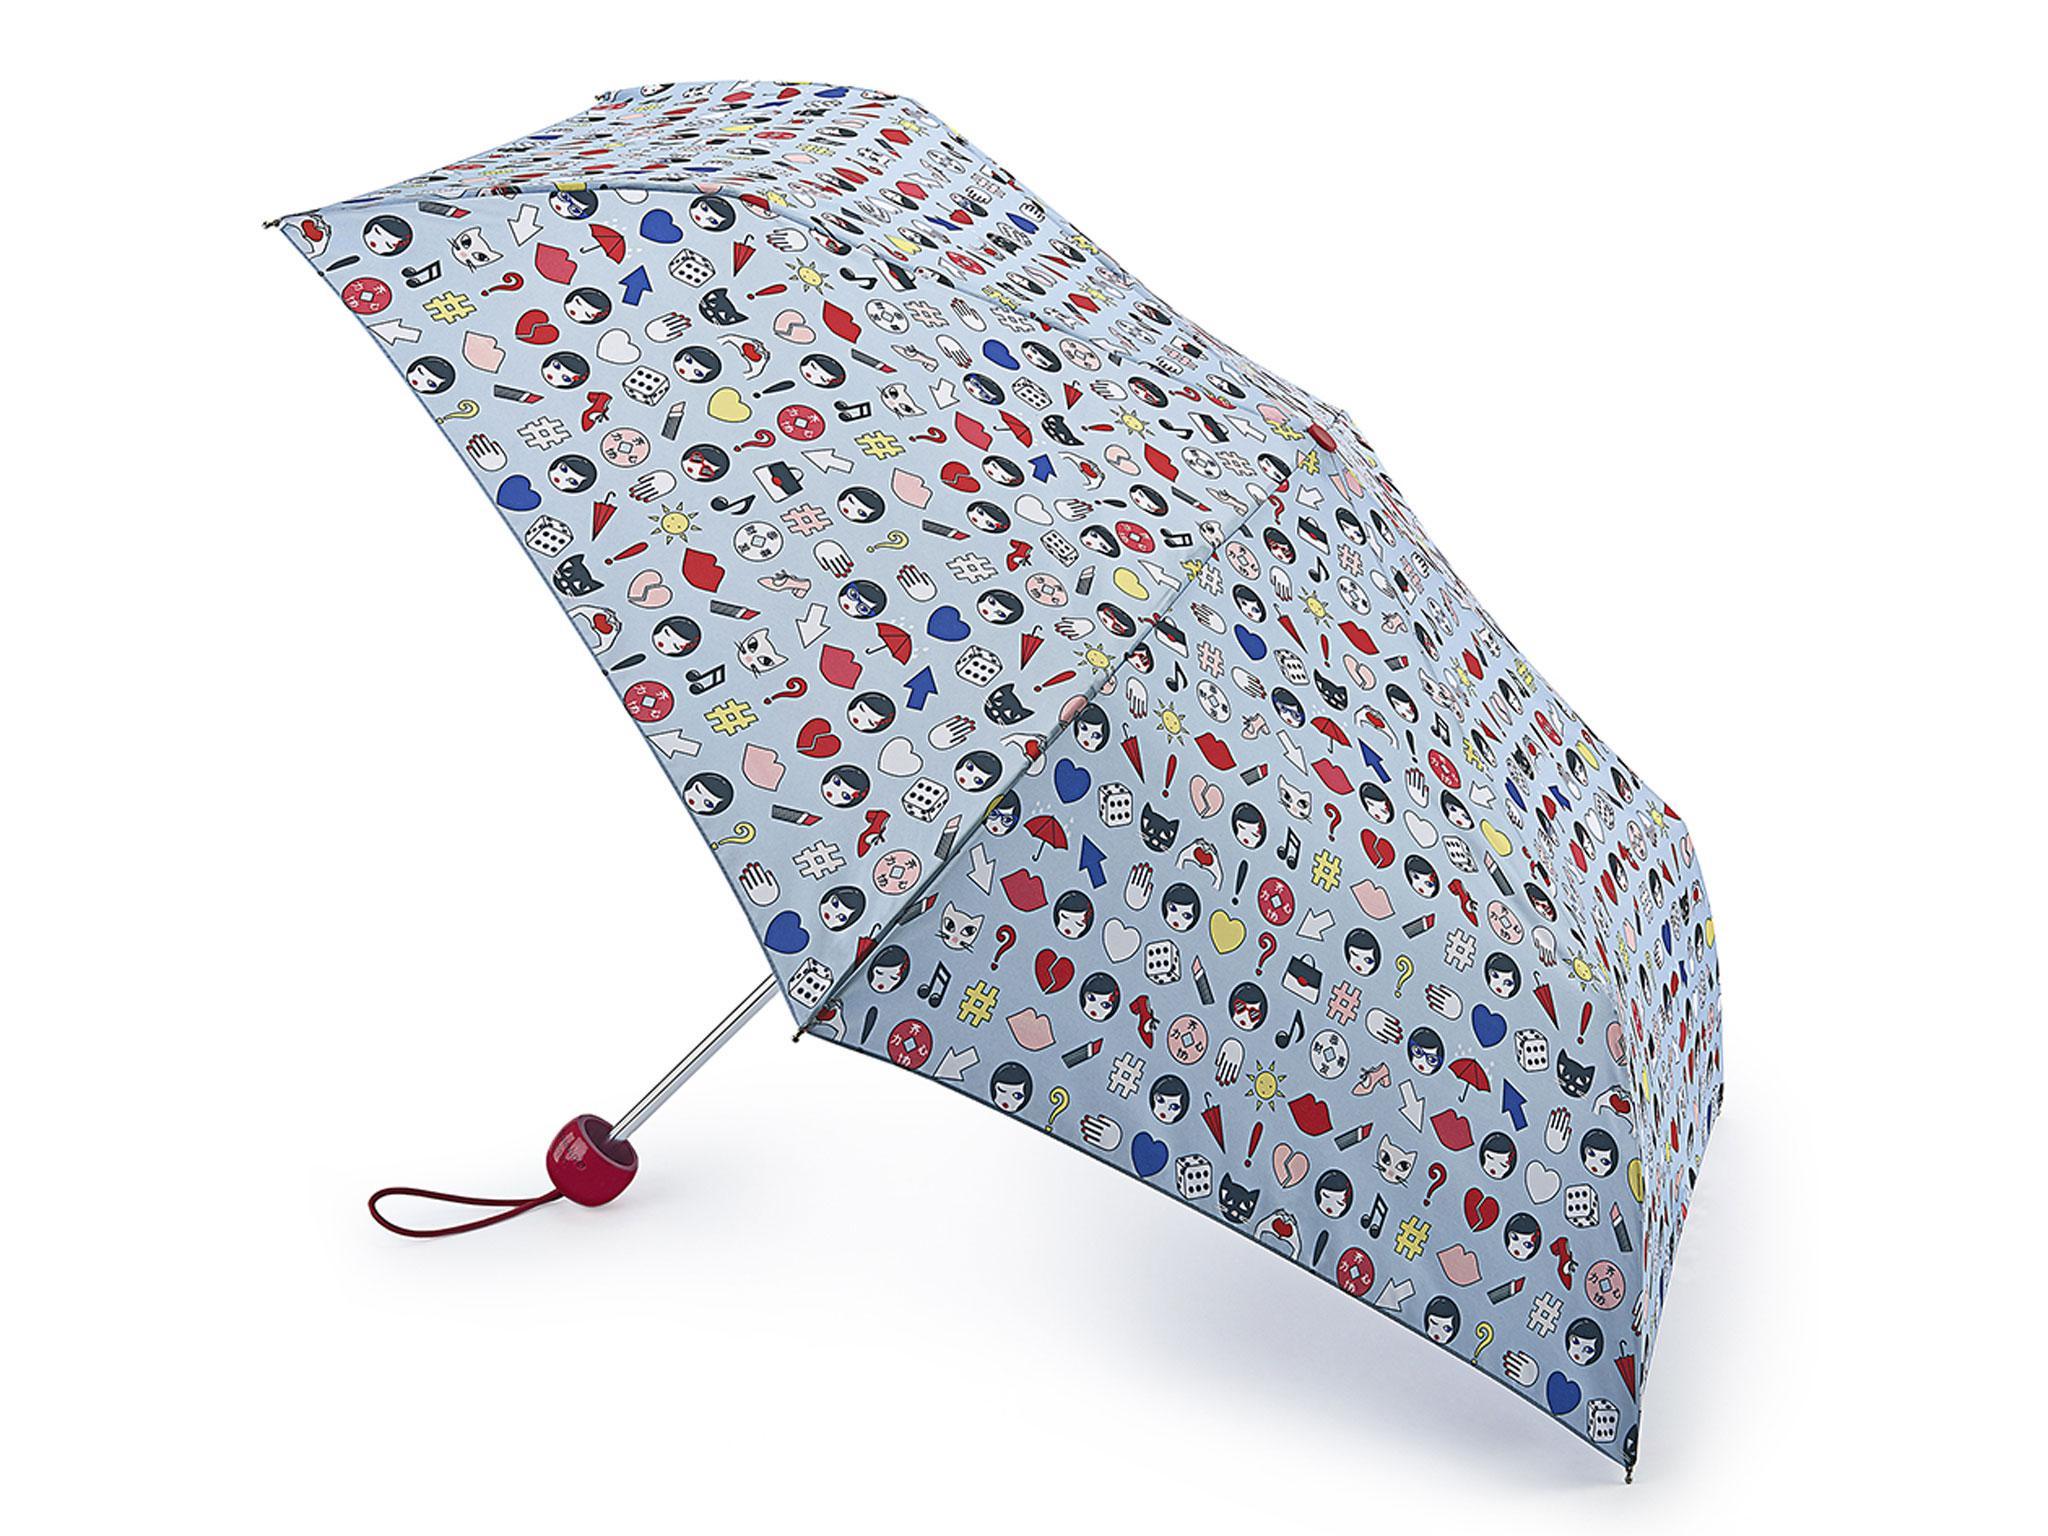 eafbf6eb22018 Fulton Umbrellas Lulu Guinness by Fulton  £28